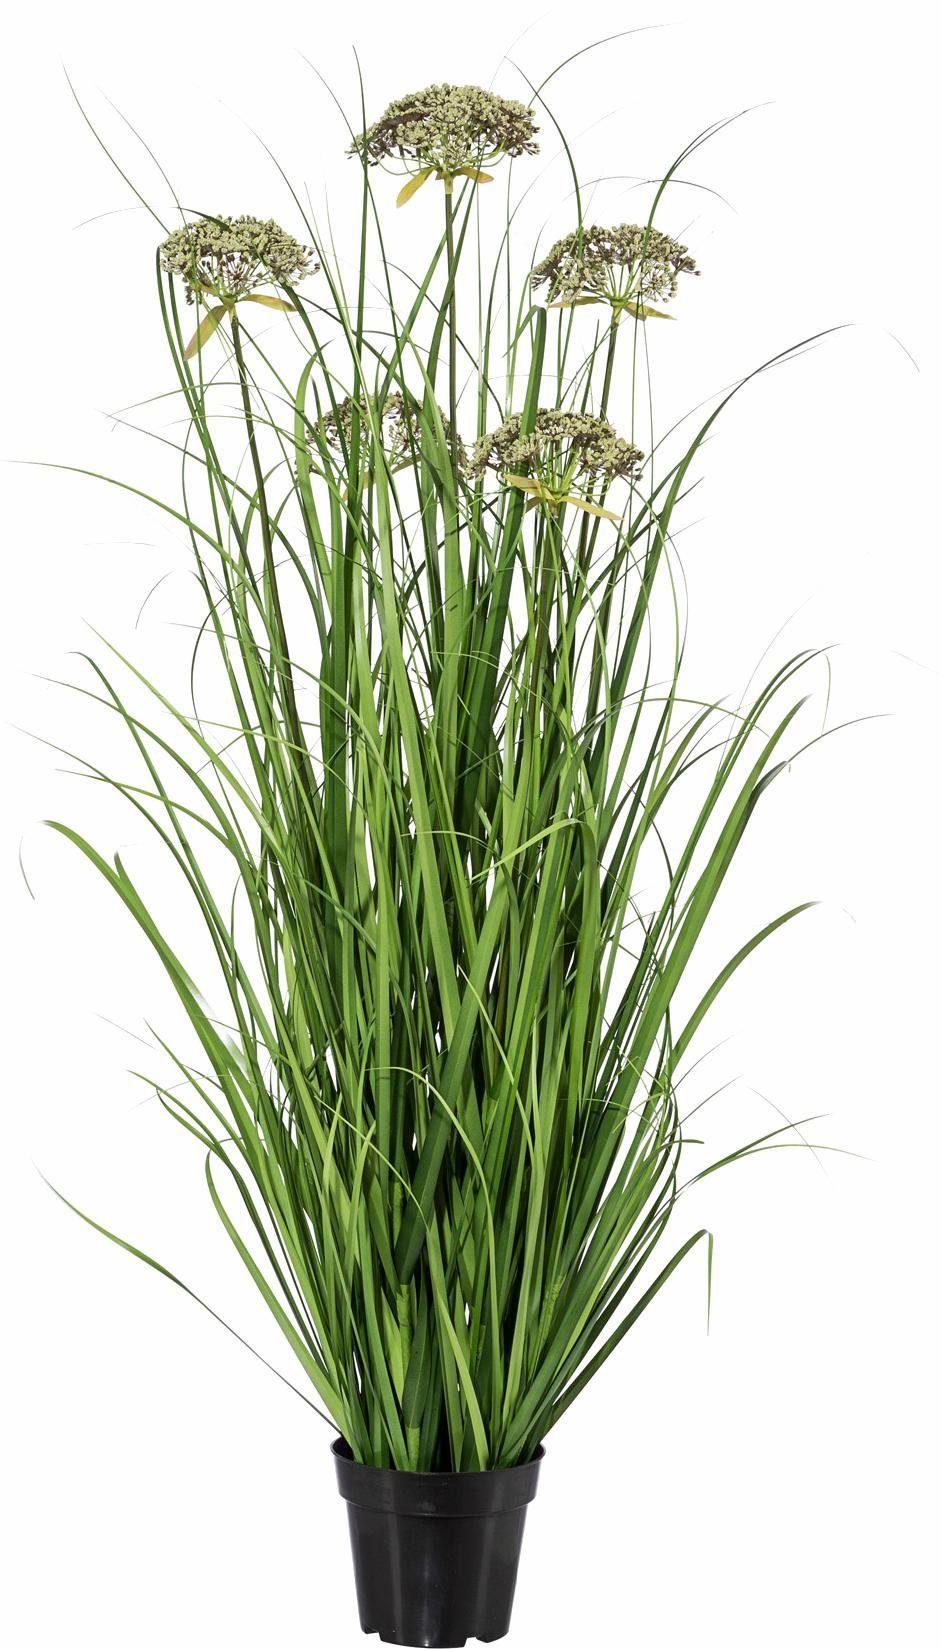 Home affaire Kunstpflanze »Gras« in Kunststofftopf